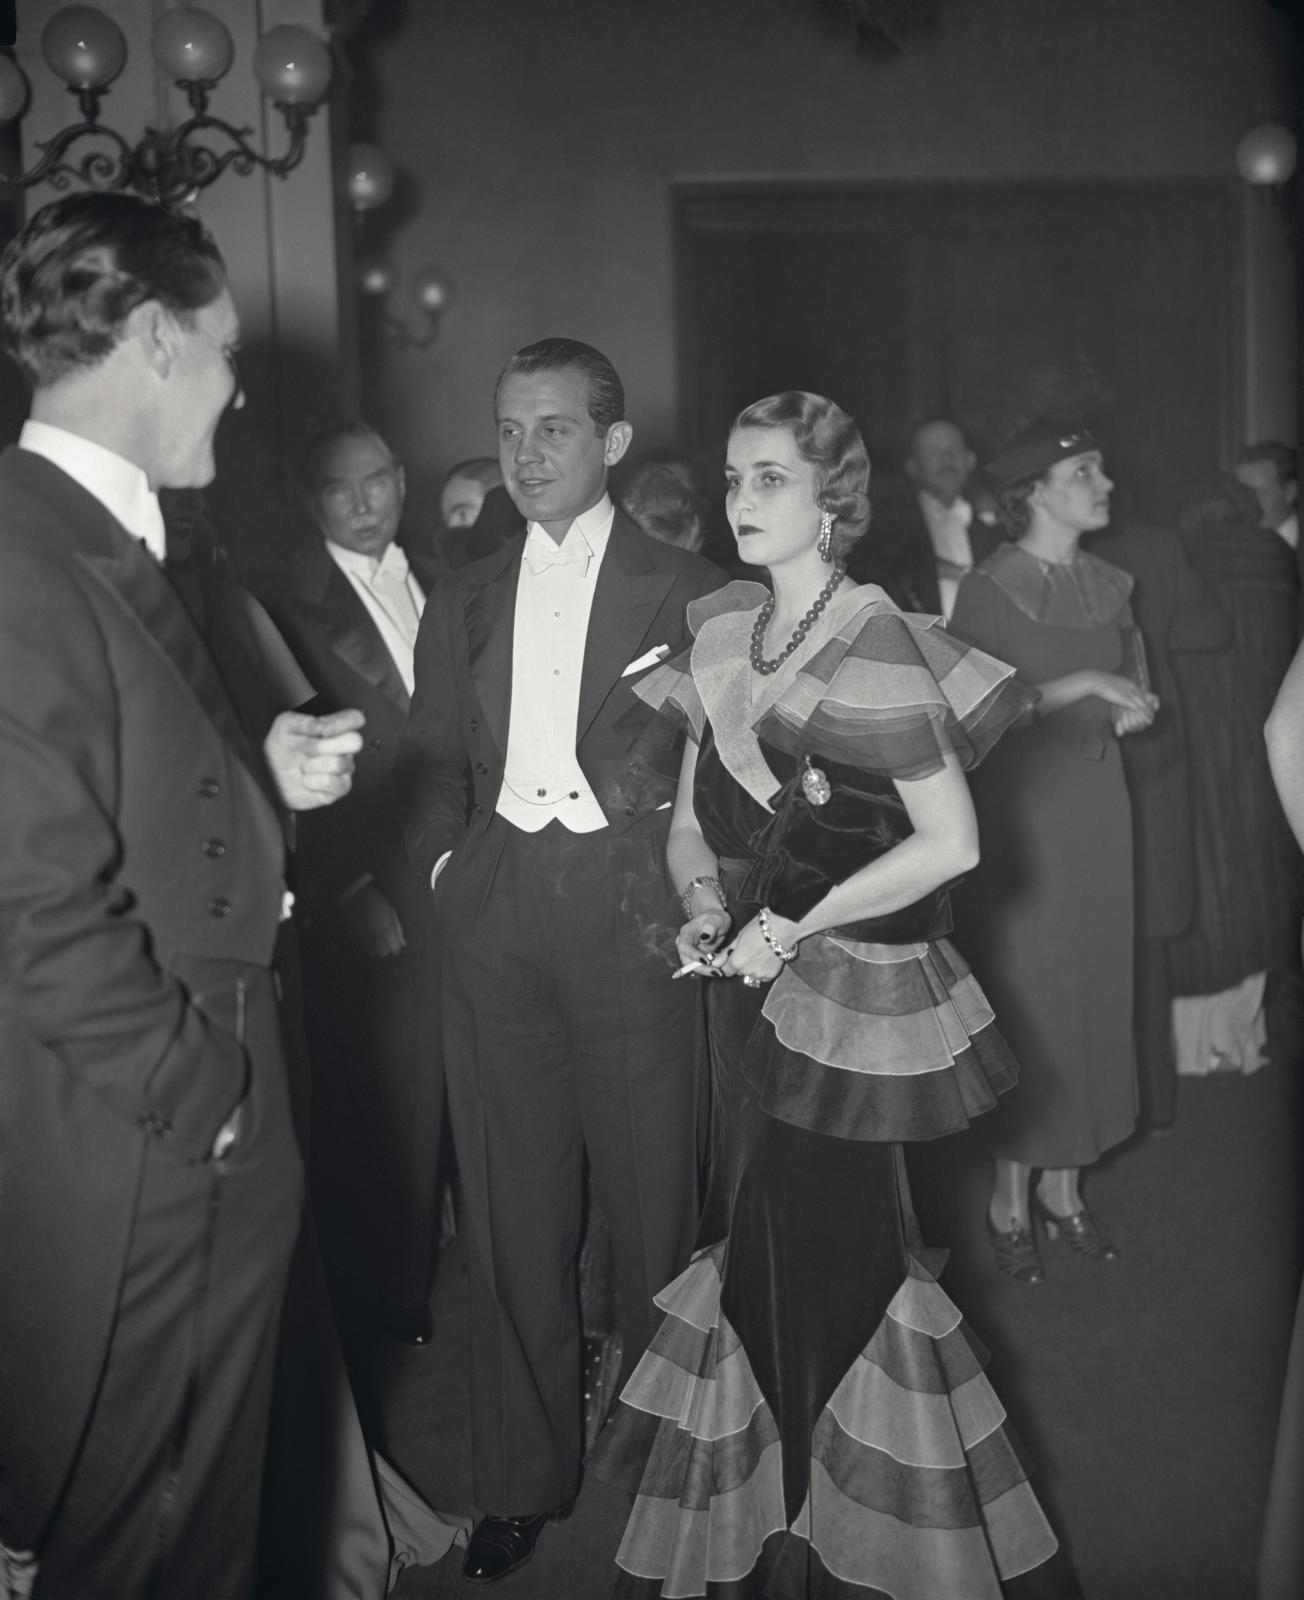 Barbara Hutton et son mari le prince Alexis Mdivani, arrivant au Metropolitan Opera de New York, 1933, portant son collier en jade jadéite.